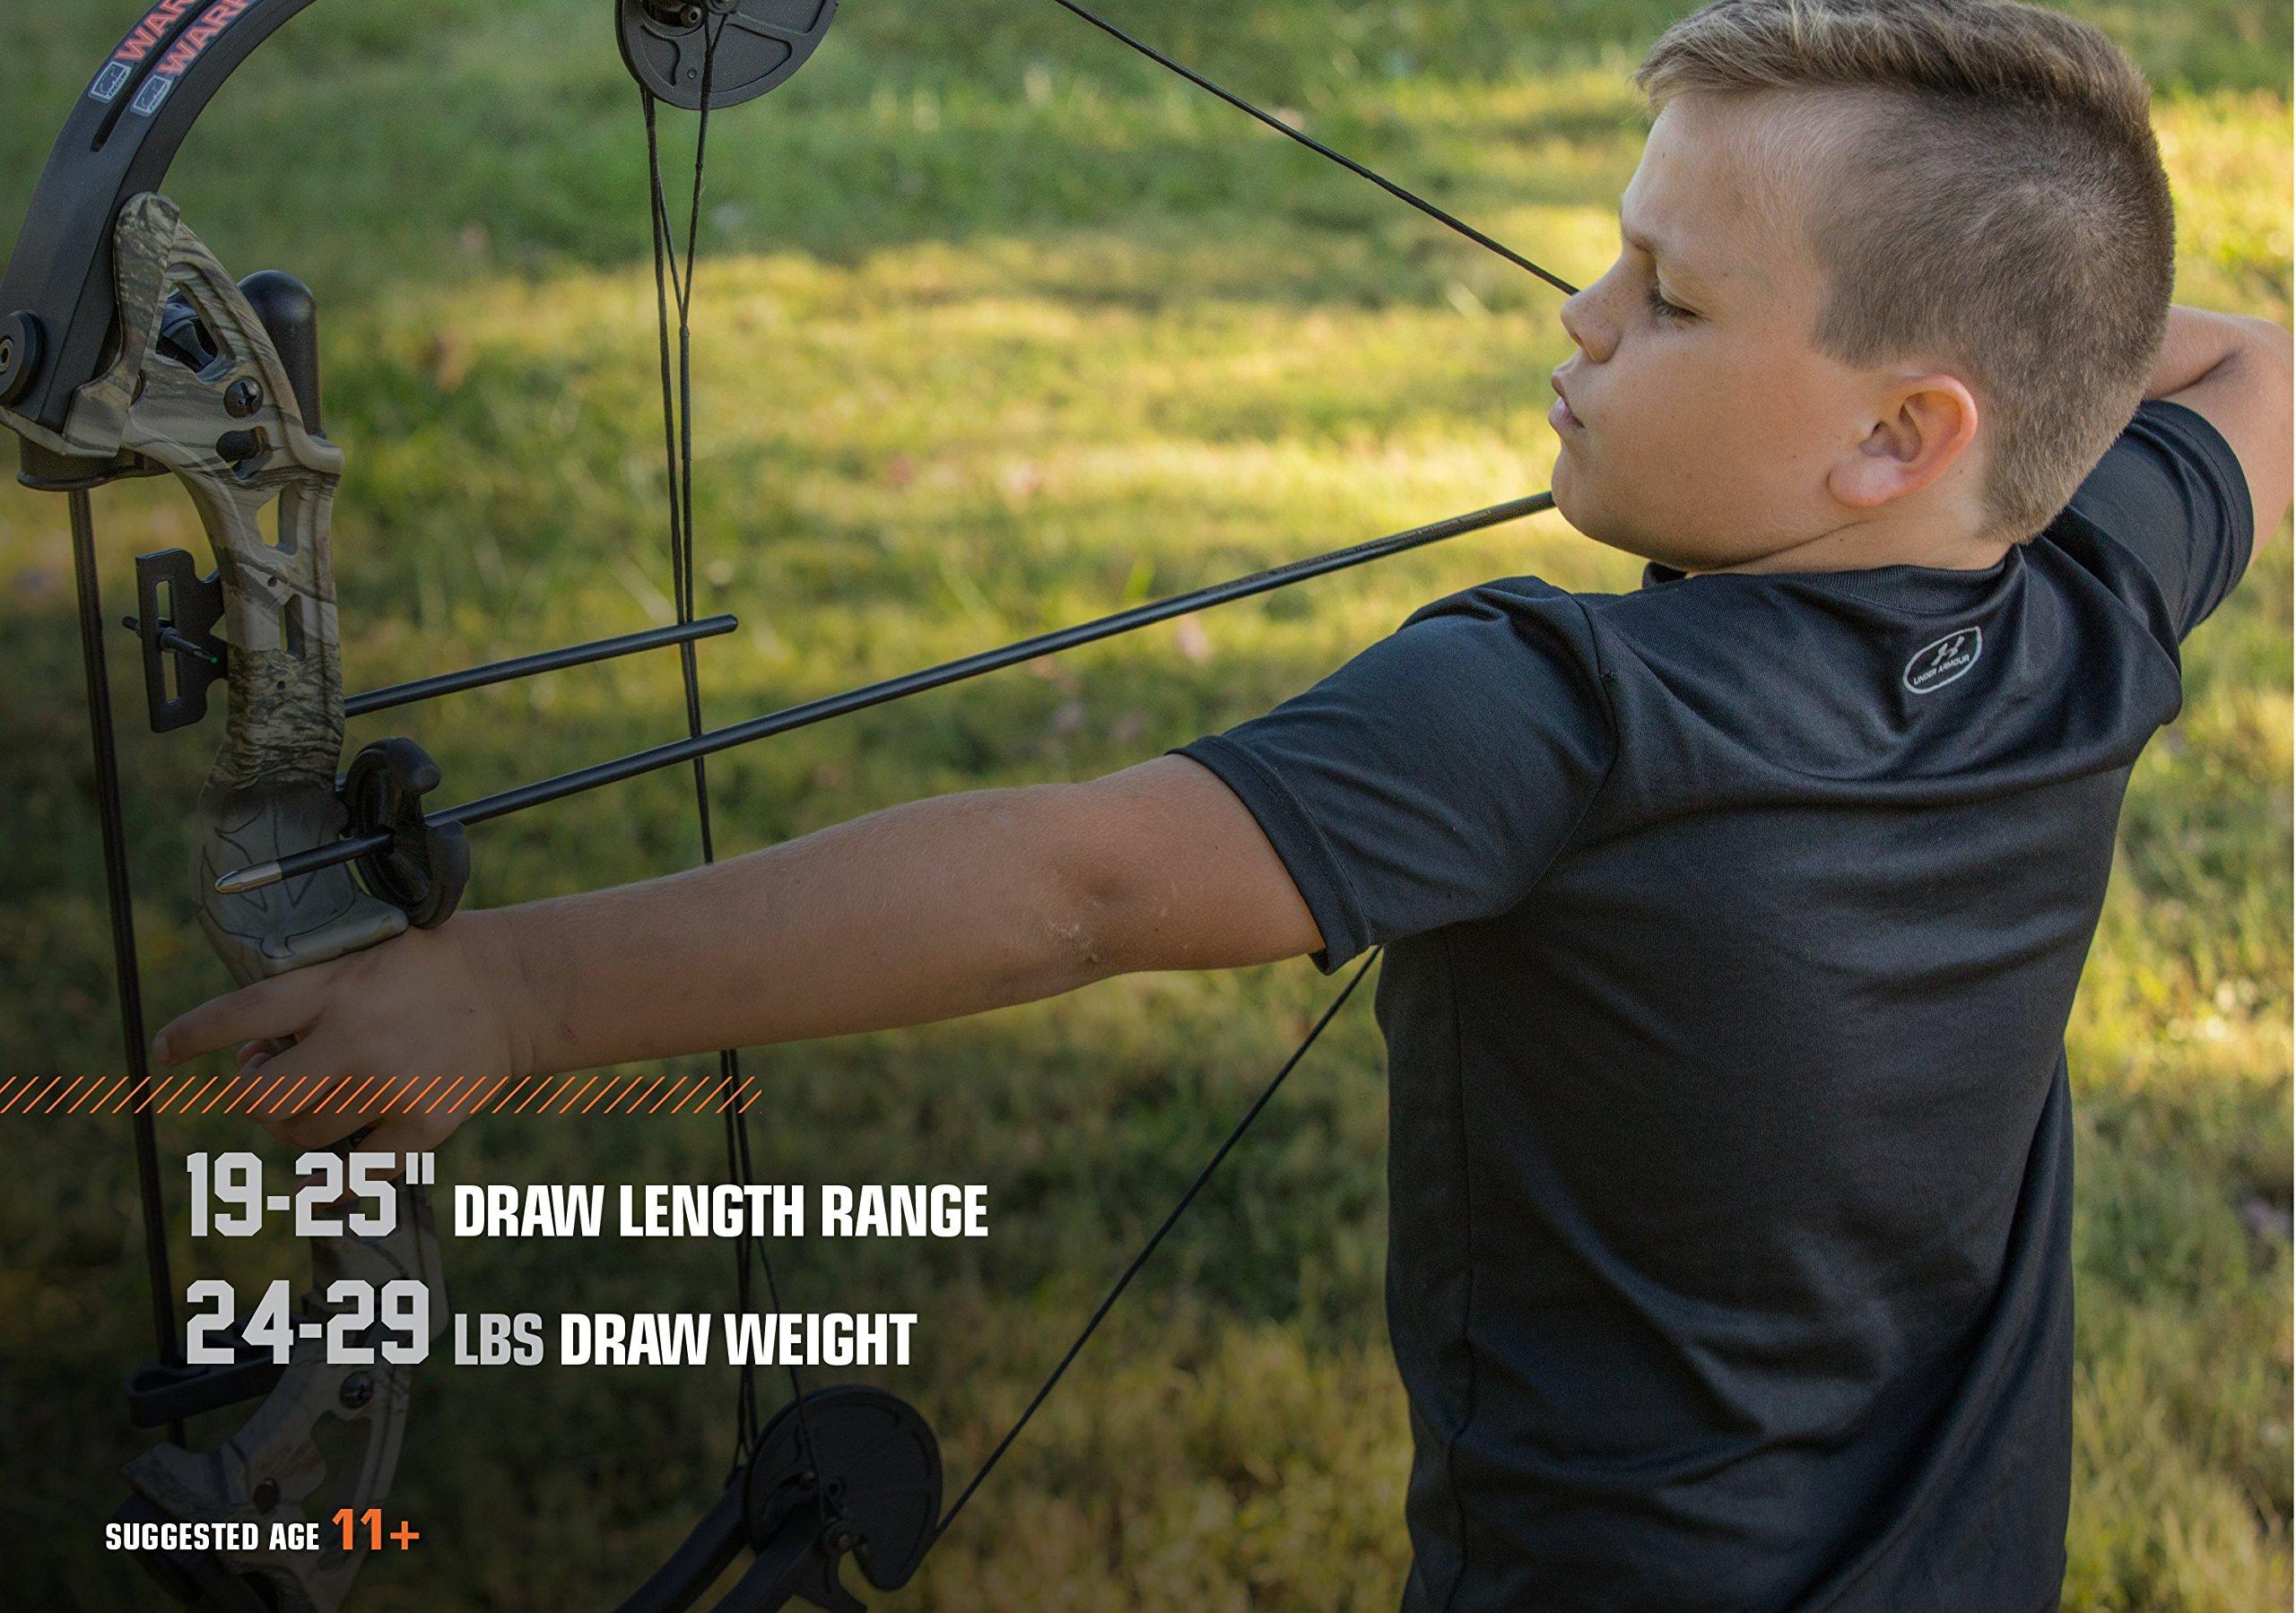 Bear Archery Warrior Youth Bow by Bear Archery (Image #3)